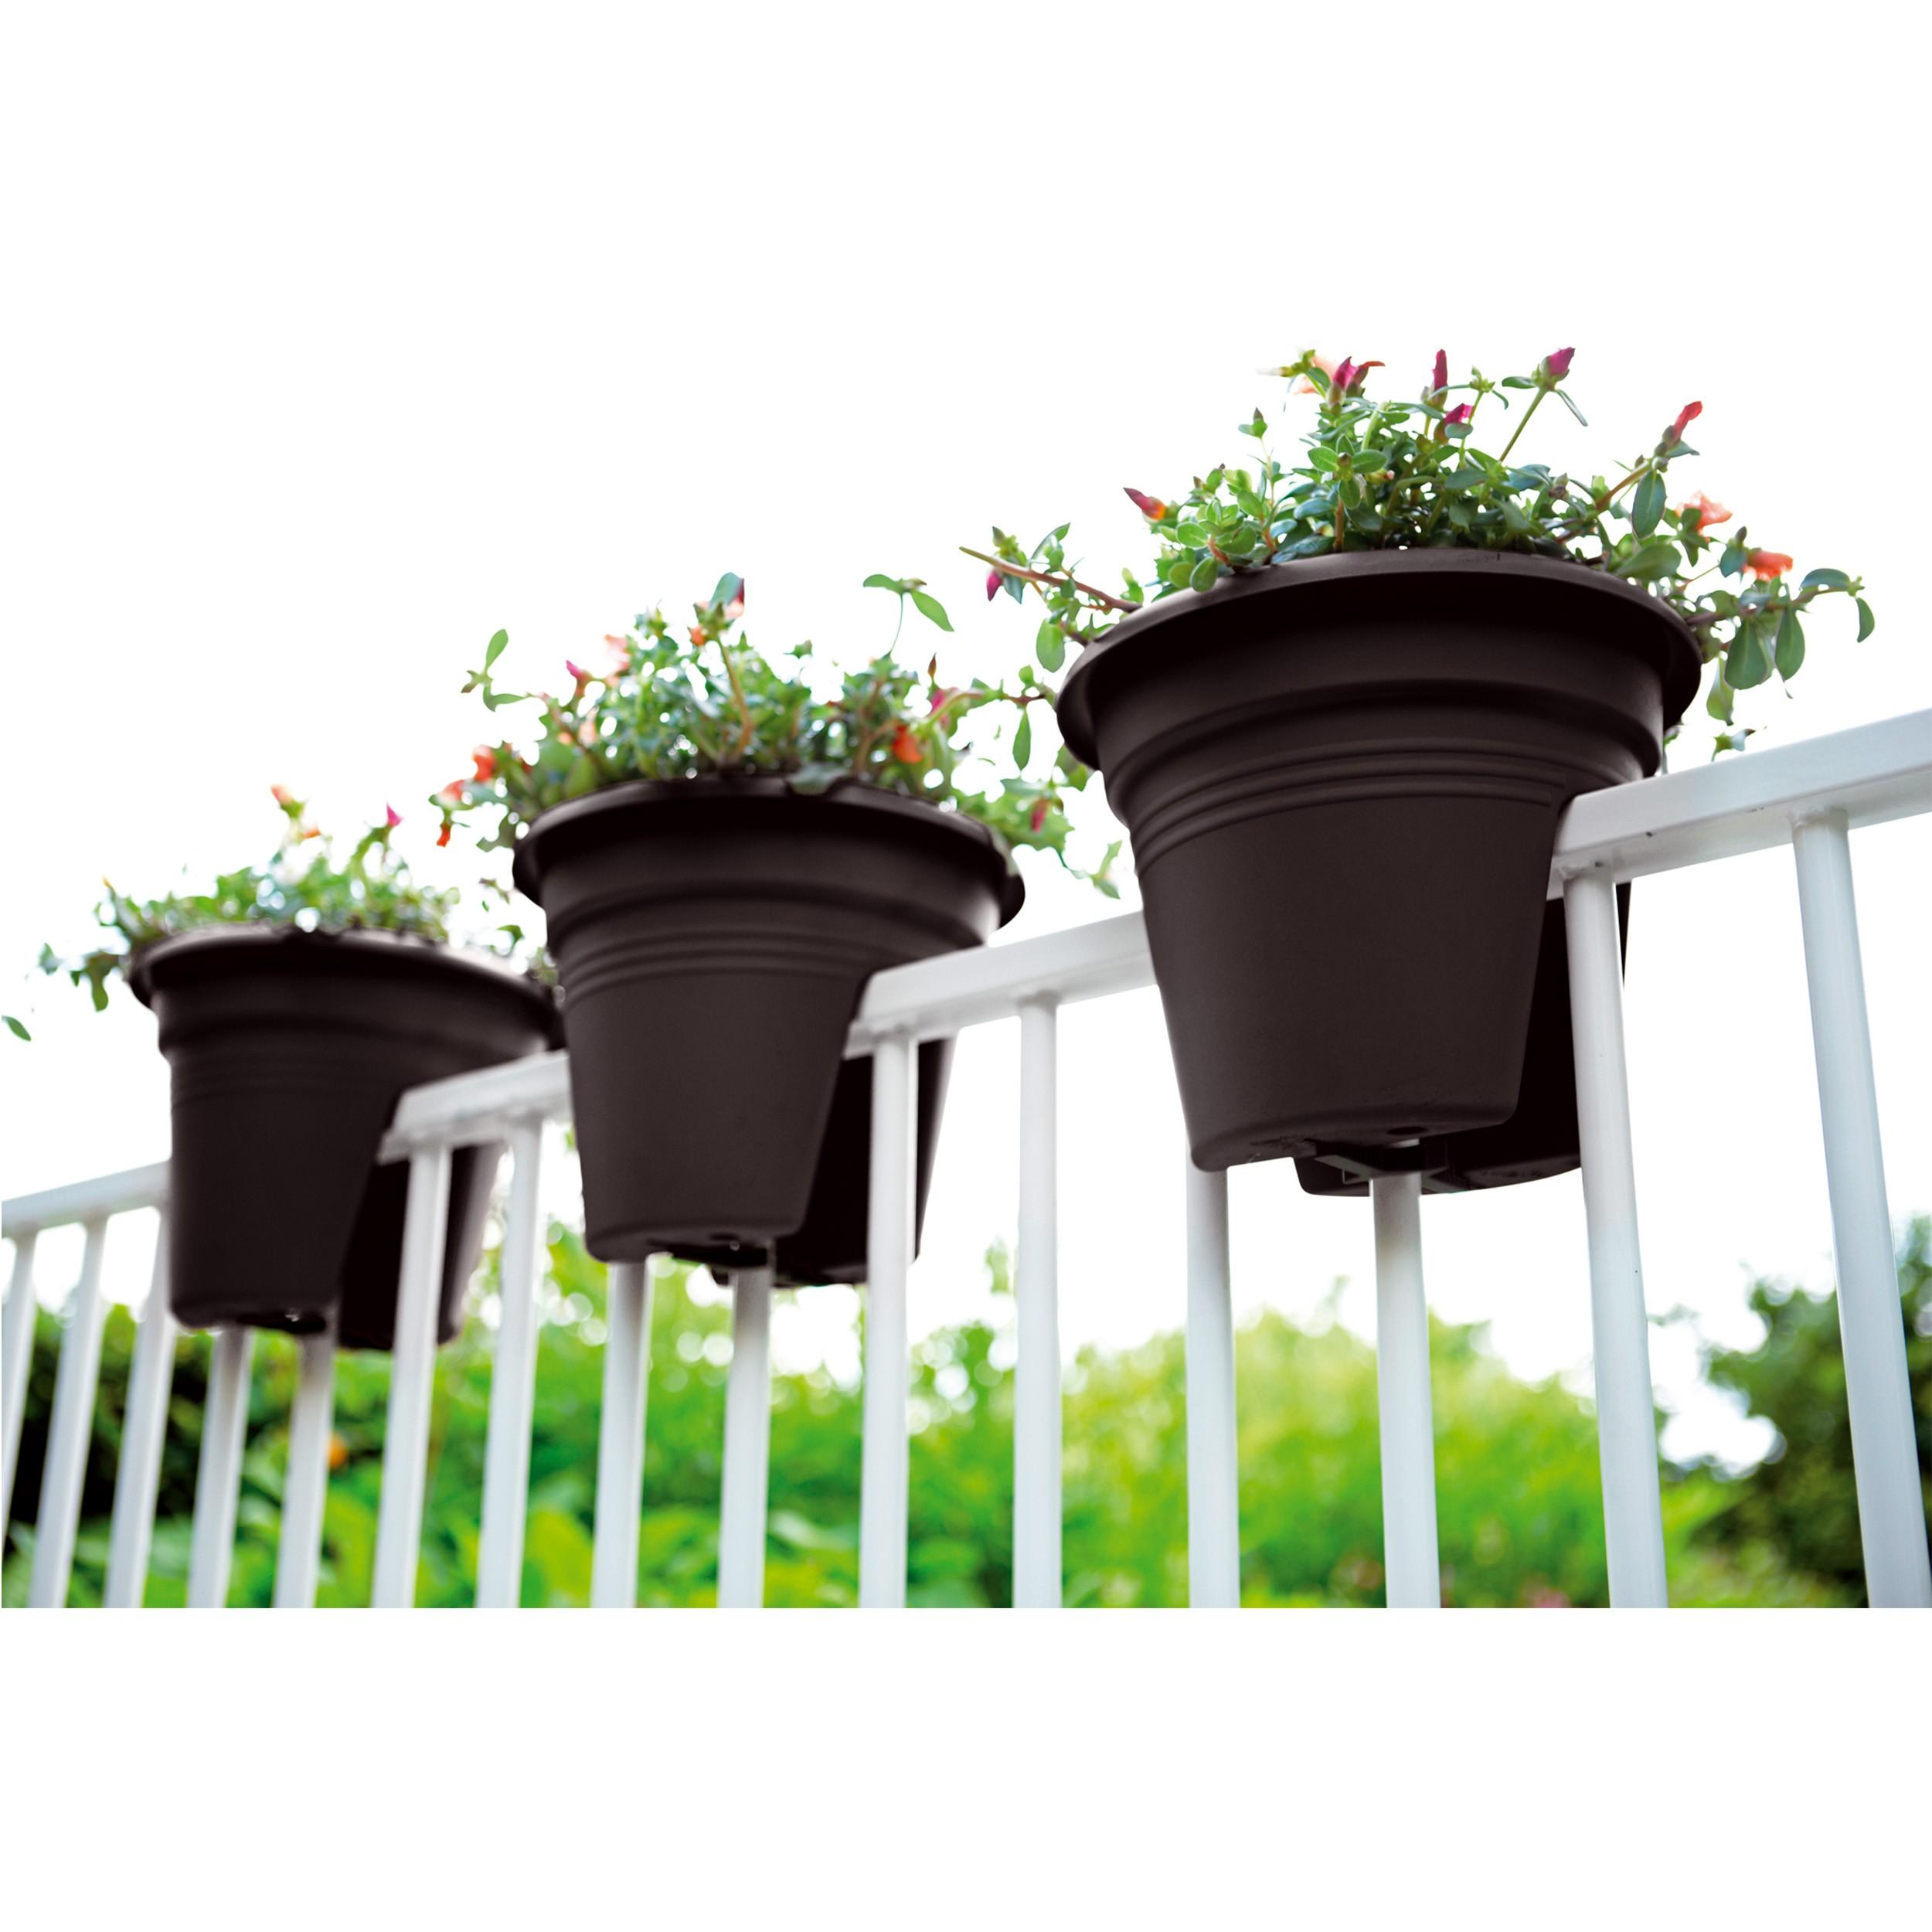 pflanzgef green basics flower bridge d30cm. Black Bedroom Furniture Sets. Home Design Ideas